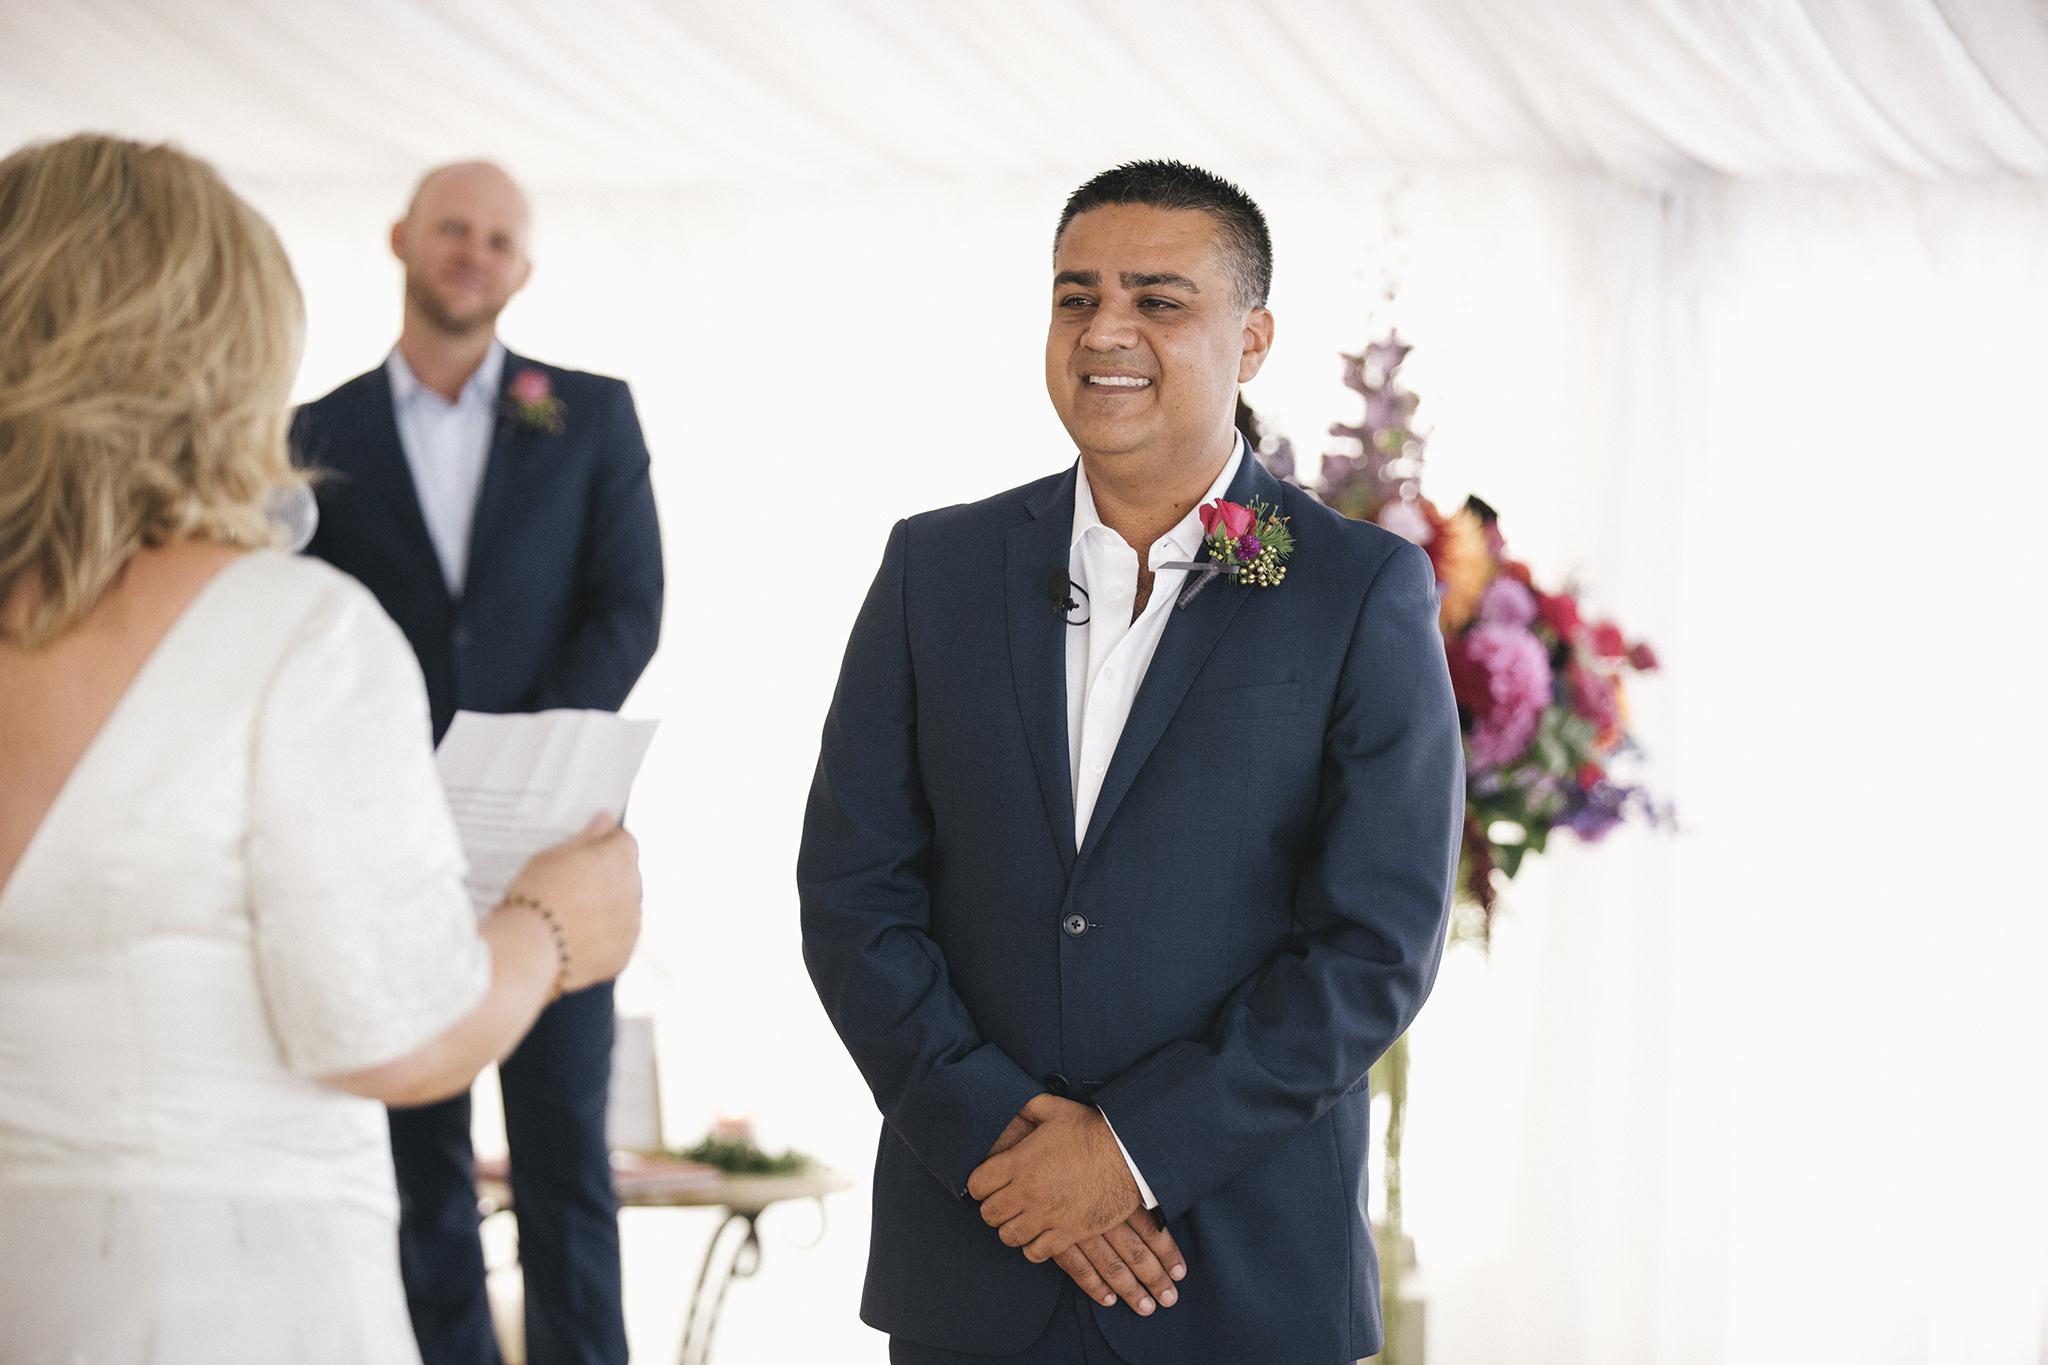 Neil and Bev Wedding Day 50.jpg